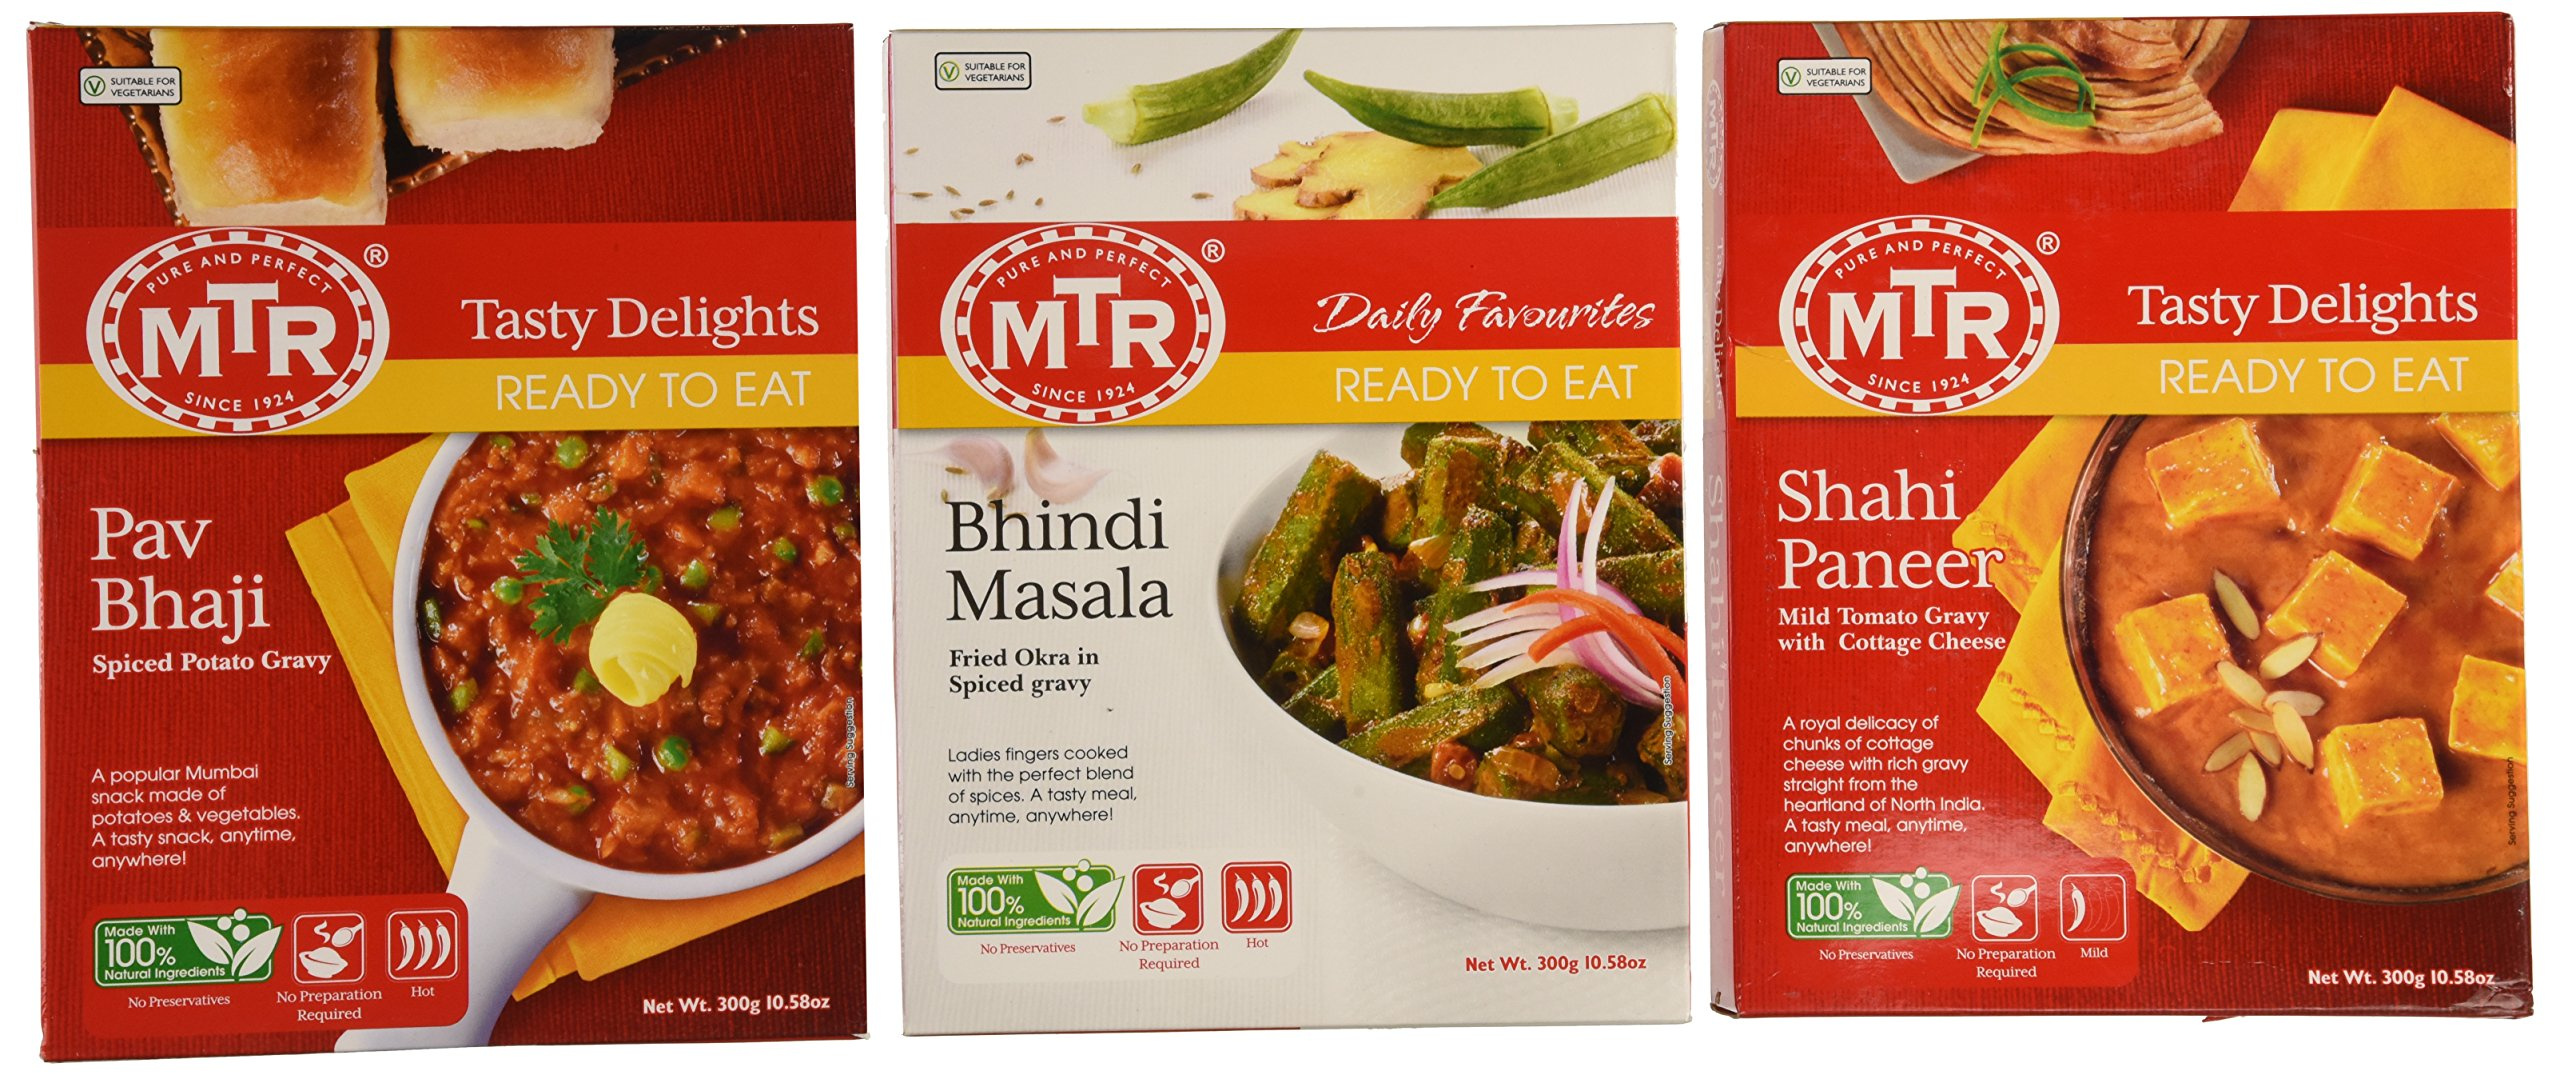 MTR Ready-to-eat Variety Pack - Shahi Paneer - 300g / Bhindi Masala - 300g / Pav Bhaji (Total of 3 Packs)